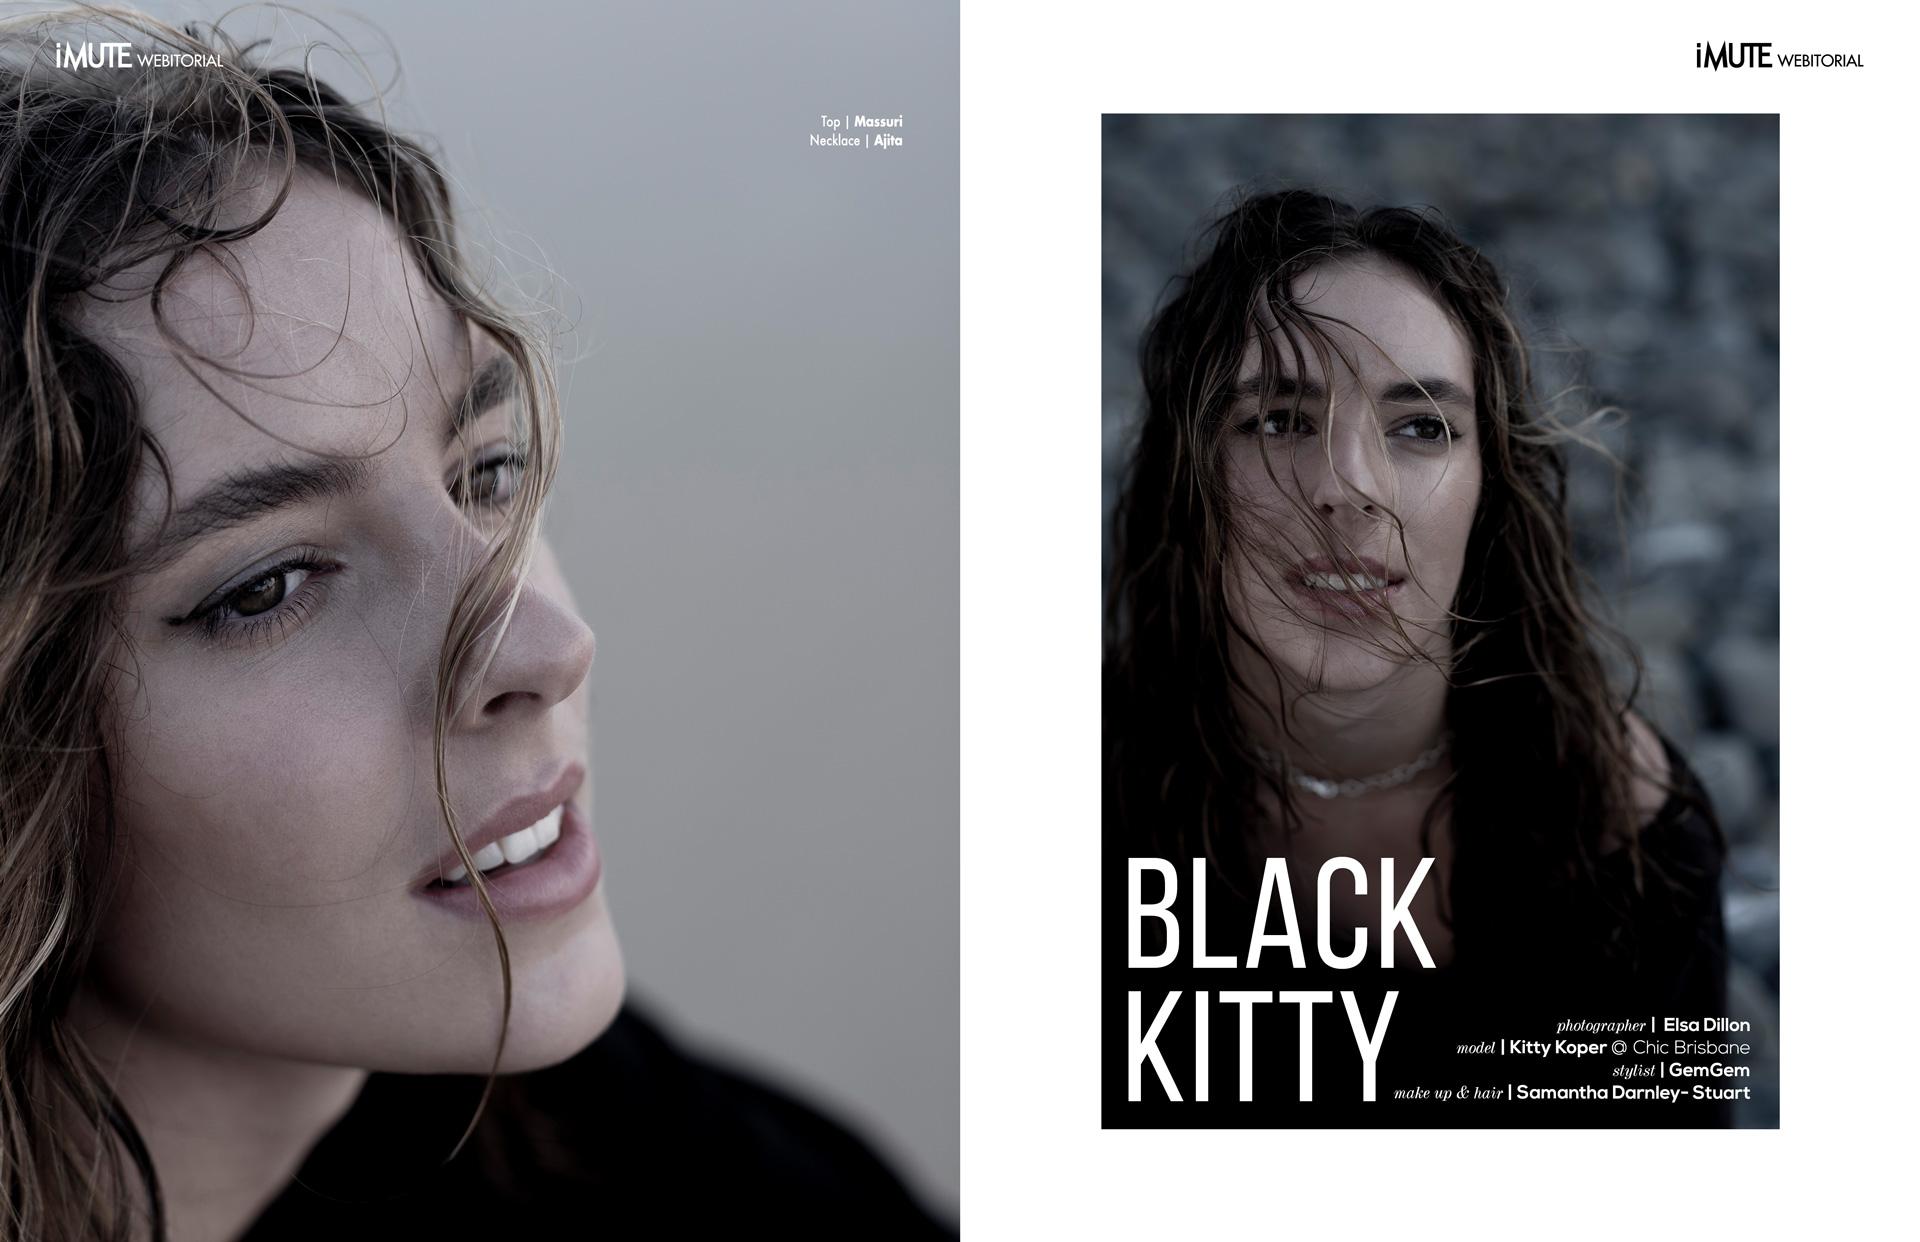 BLACK KITTY webitorial for iMute Magazine Photographer|Elsa Dillon Model| Kitty Koper @Chic Brisbane Stylist|GemGem Makeup & Hair|Samantha Darnley-Stuart